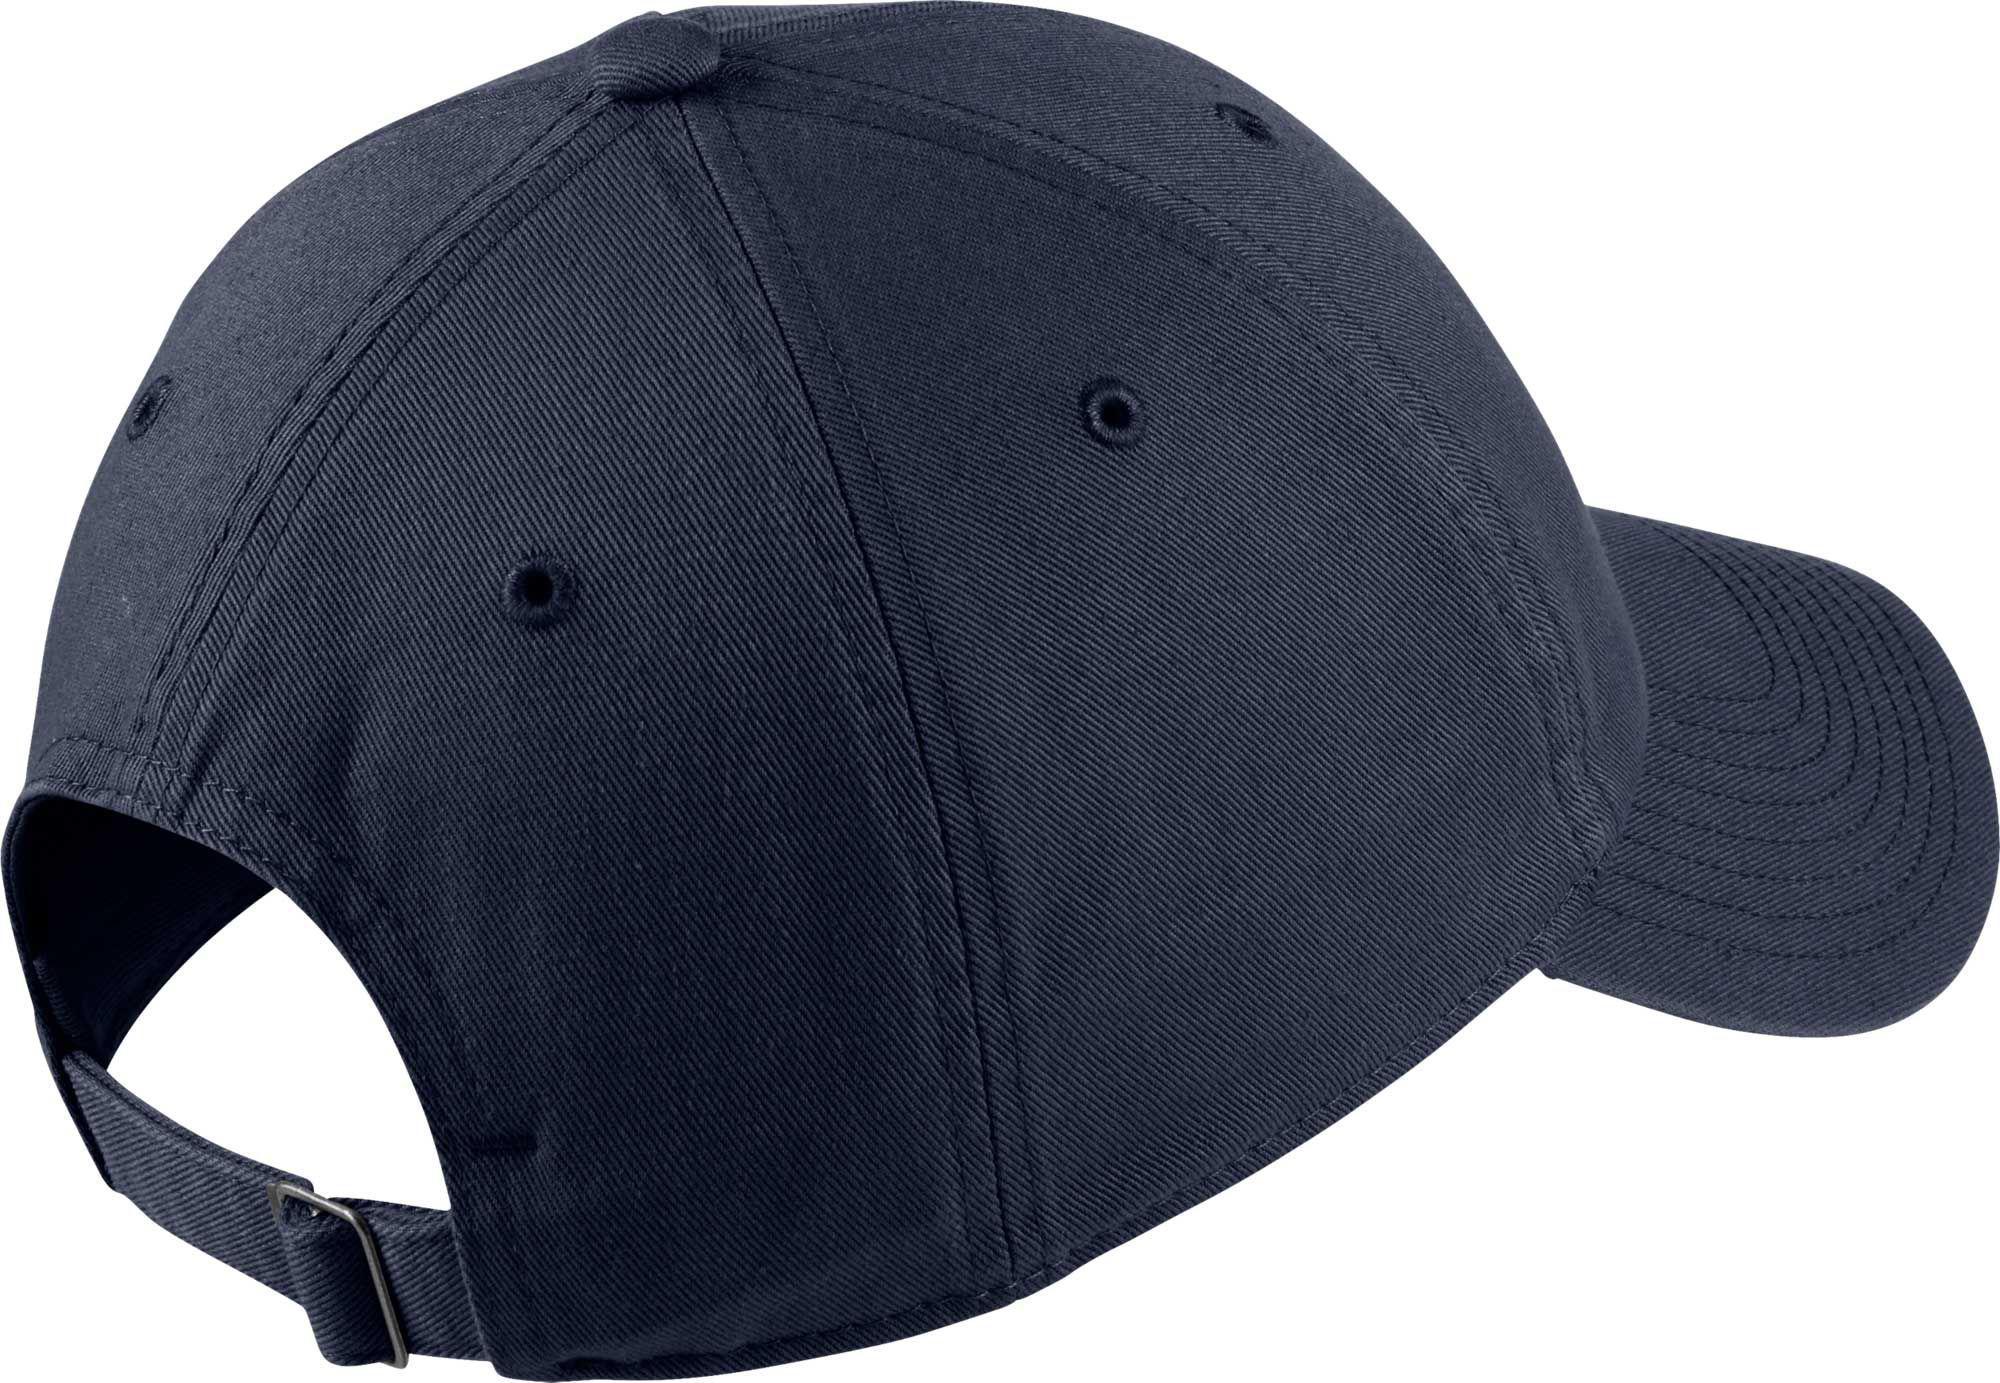 c8b91ded67 Nike - Blue Sportswear H86 Cotton Twill Adjustable Hat for Men - Lyst. View  fullscreen